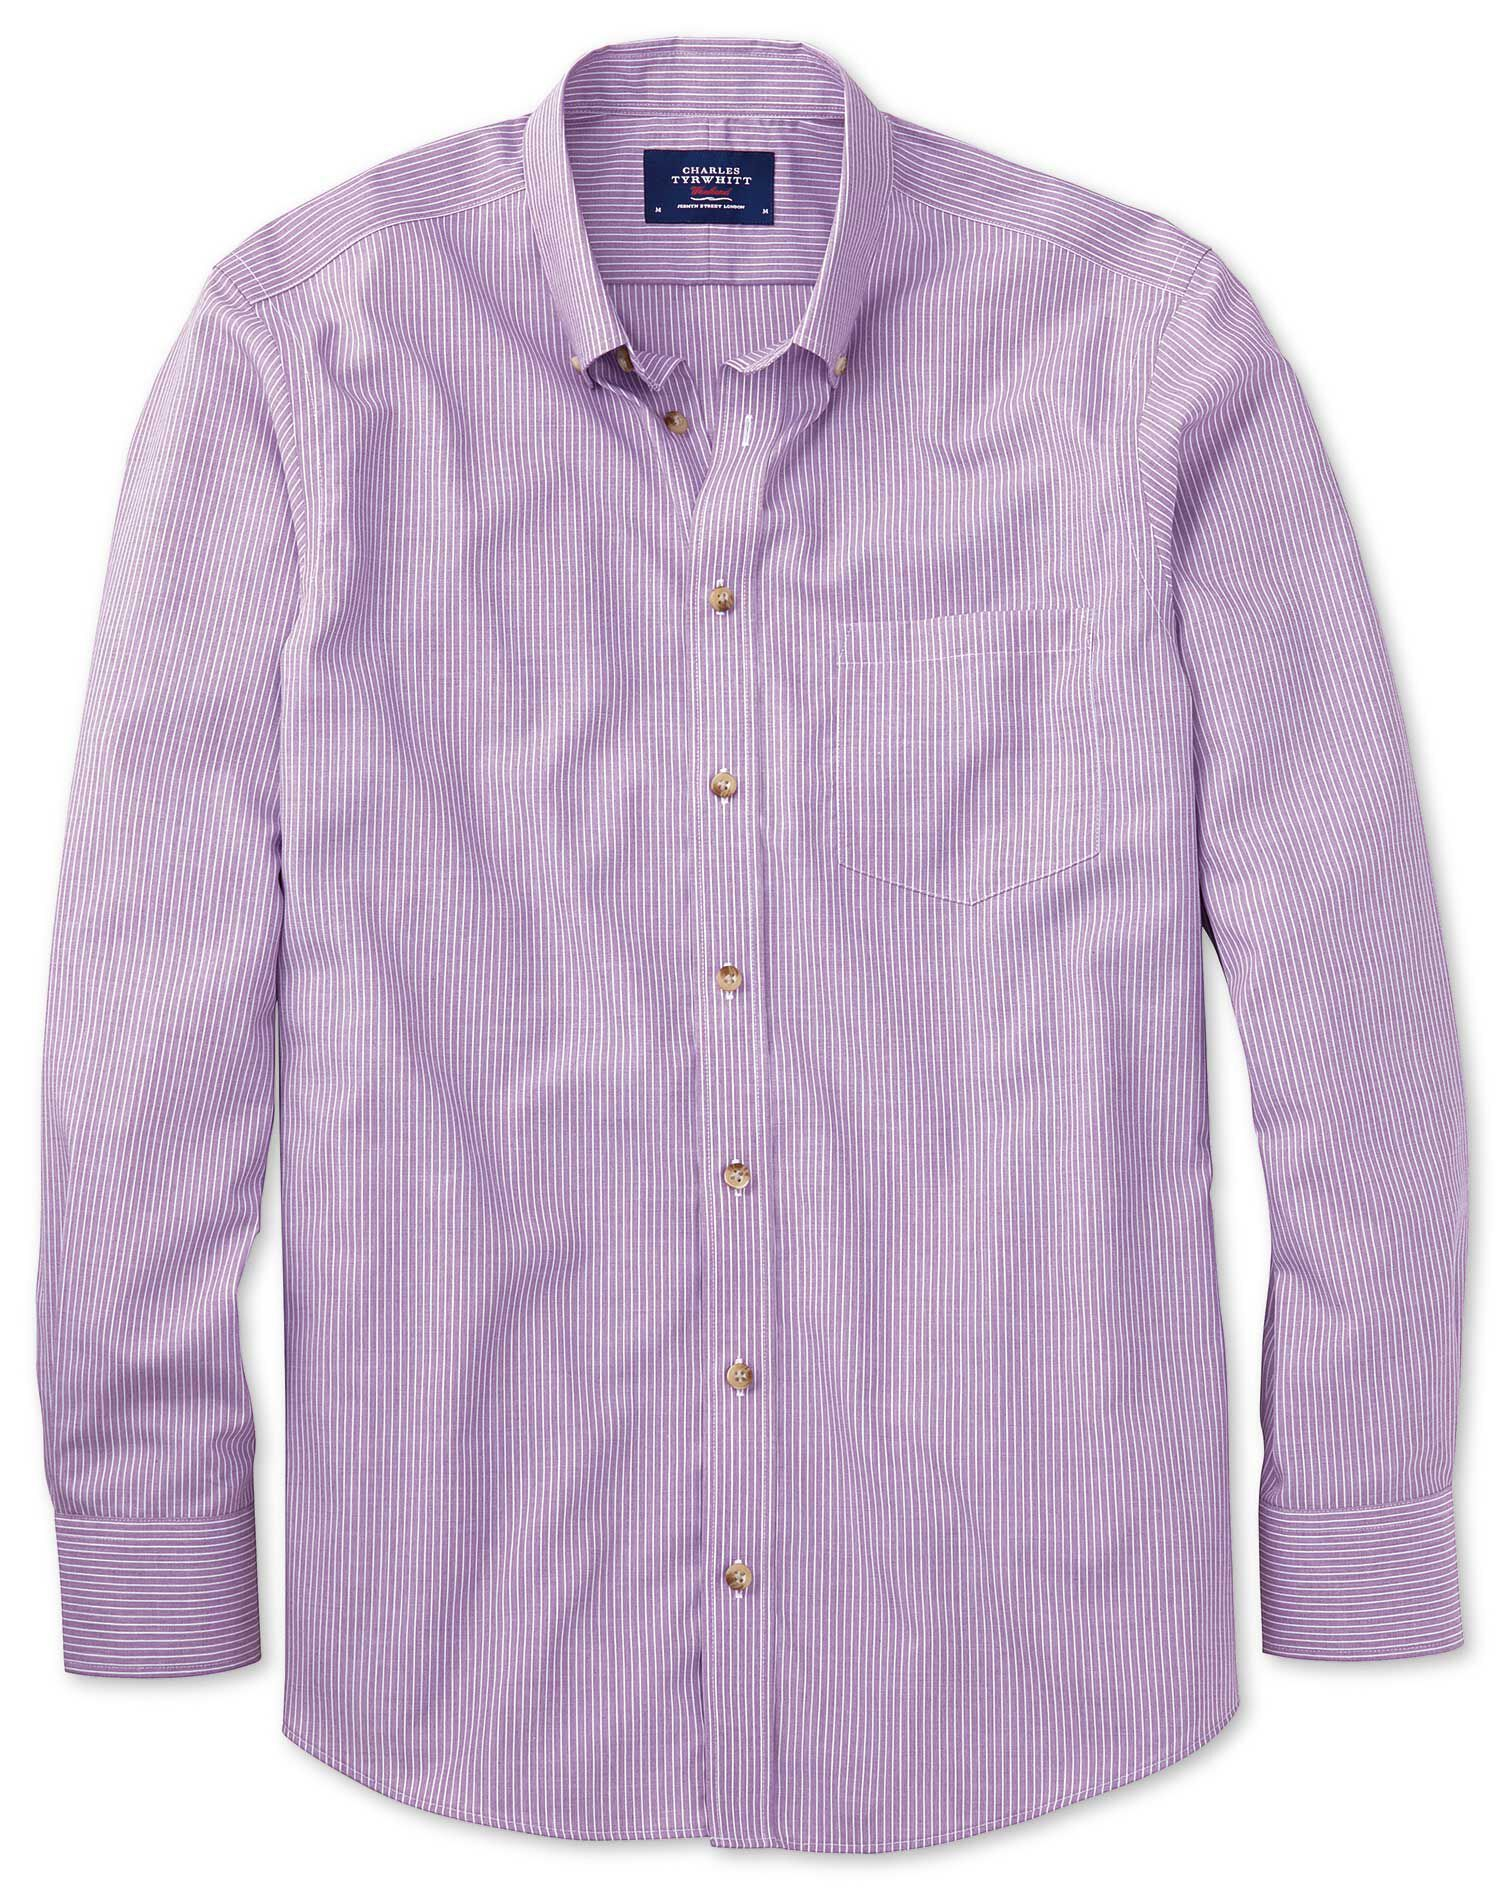 Slim Fit Non-Iron Poplin Lilac Stripe Cotton Shirt Single Cuff Size XS by Charles Tyrwhitt